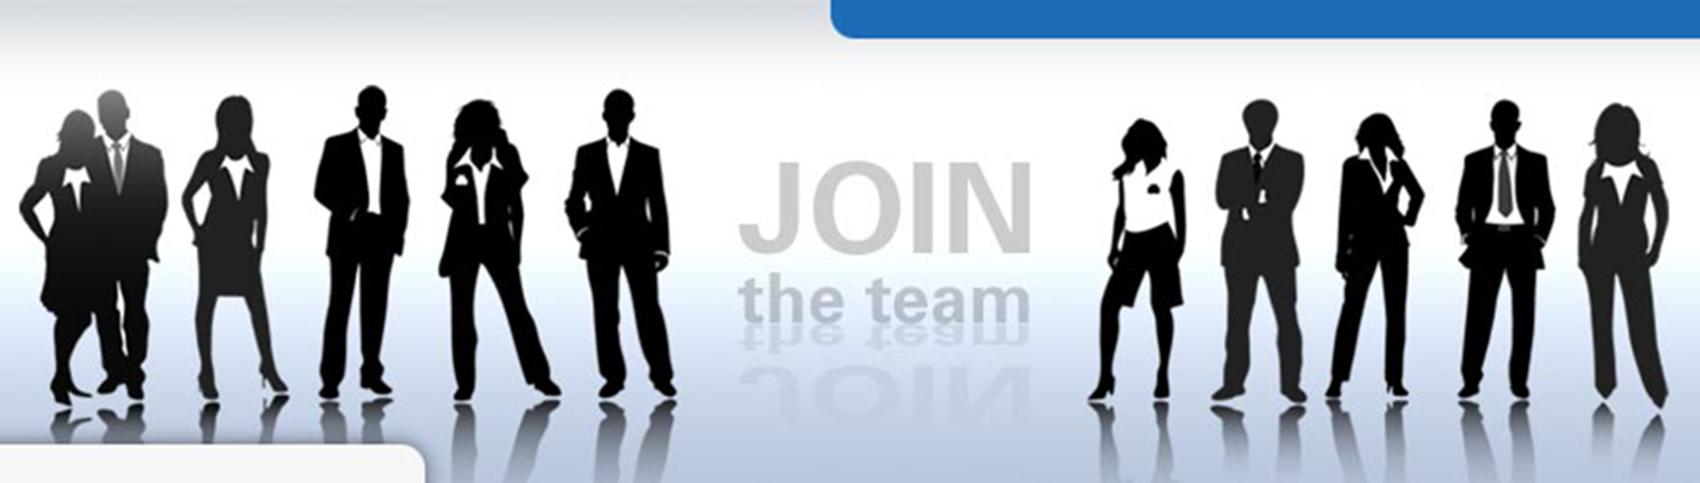 header_jobs